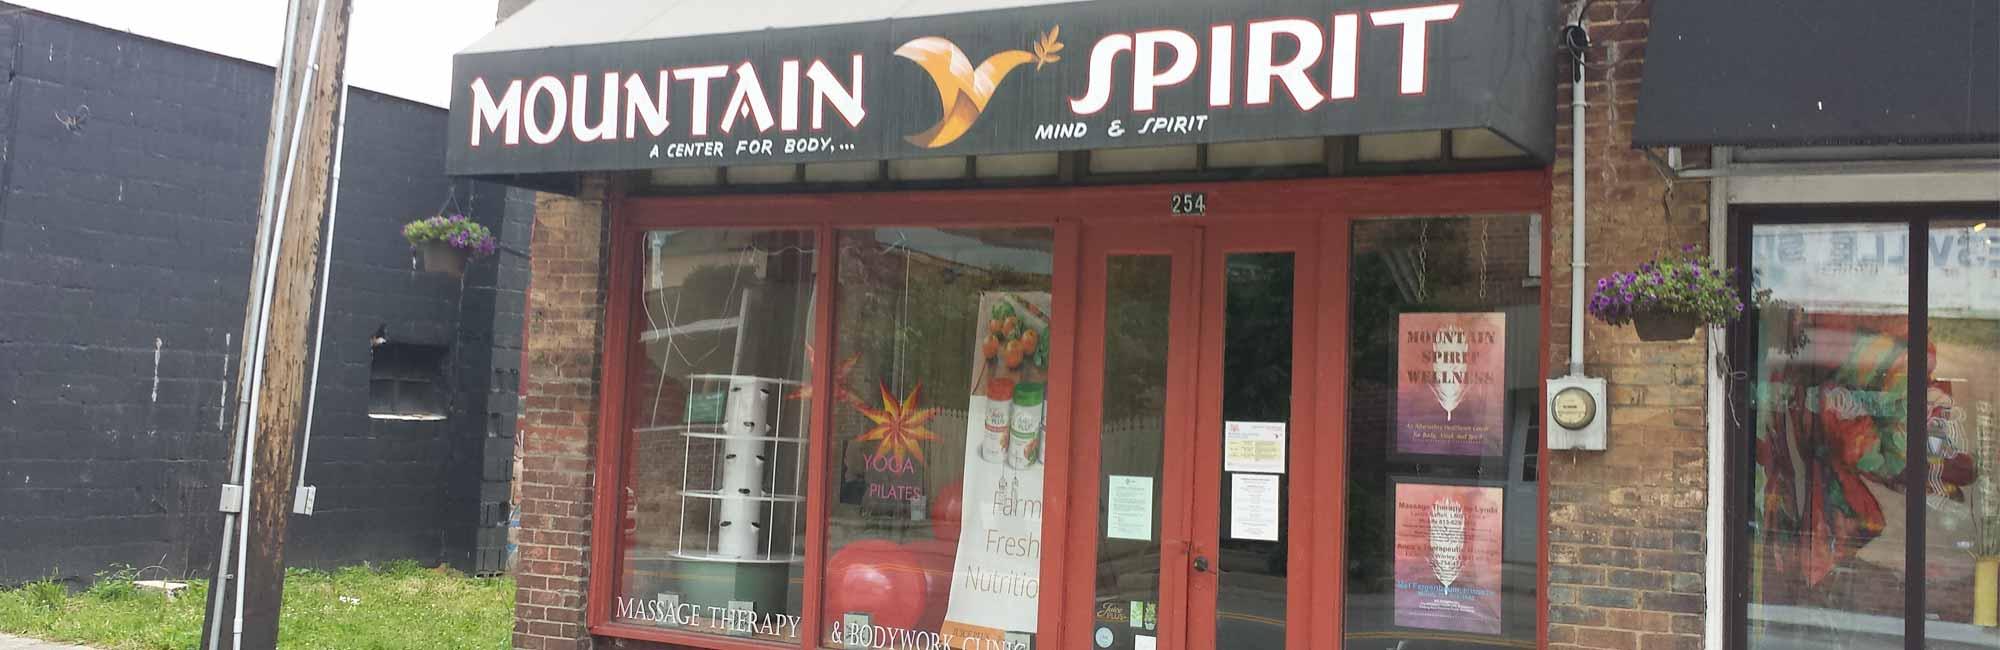 Waynesville_NC_Mountain_Spirit_Wellness